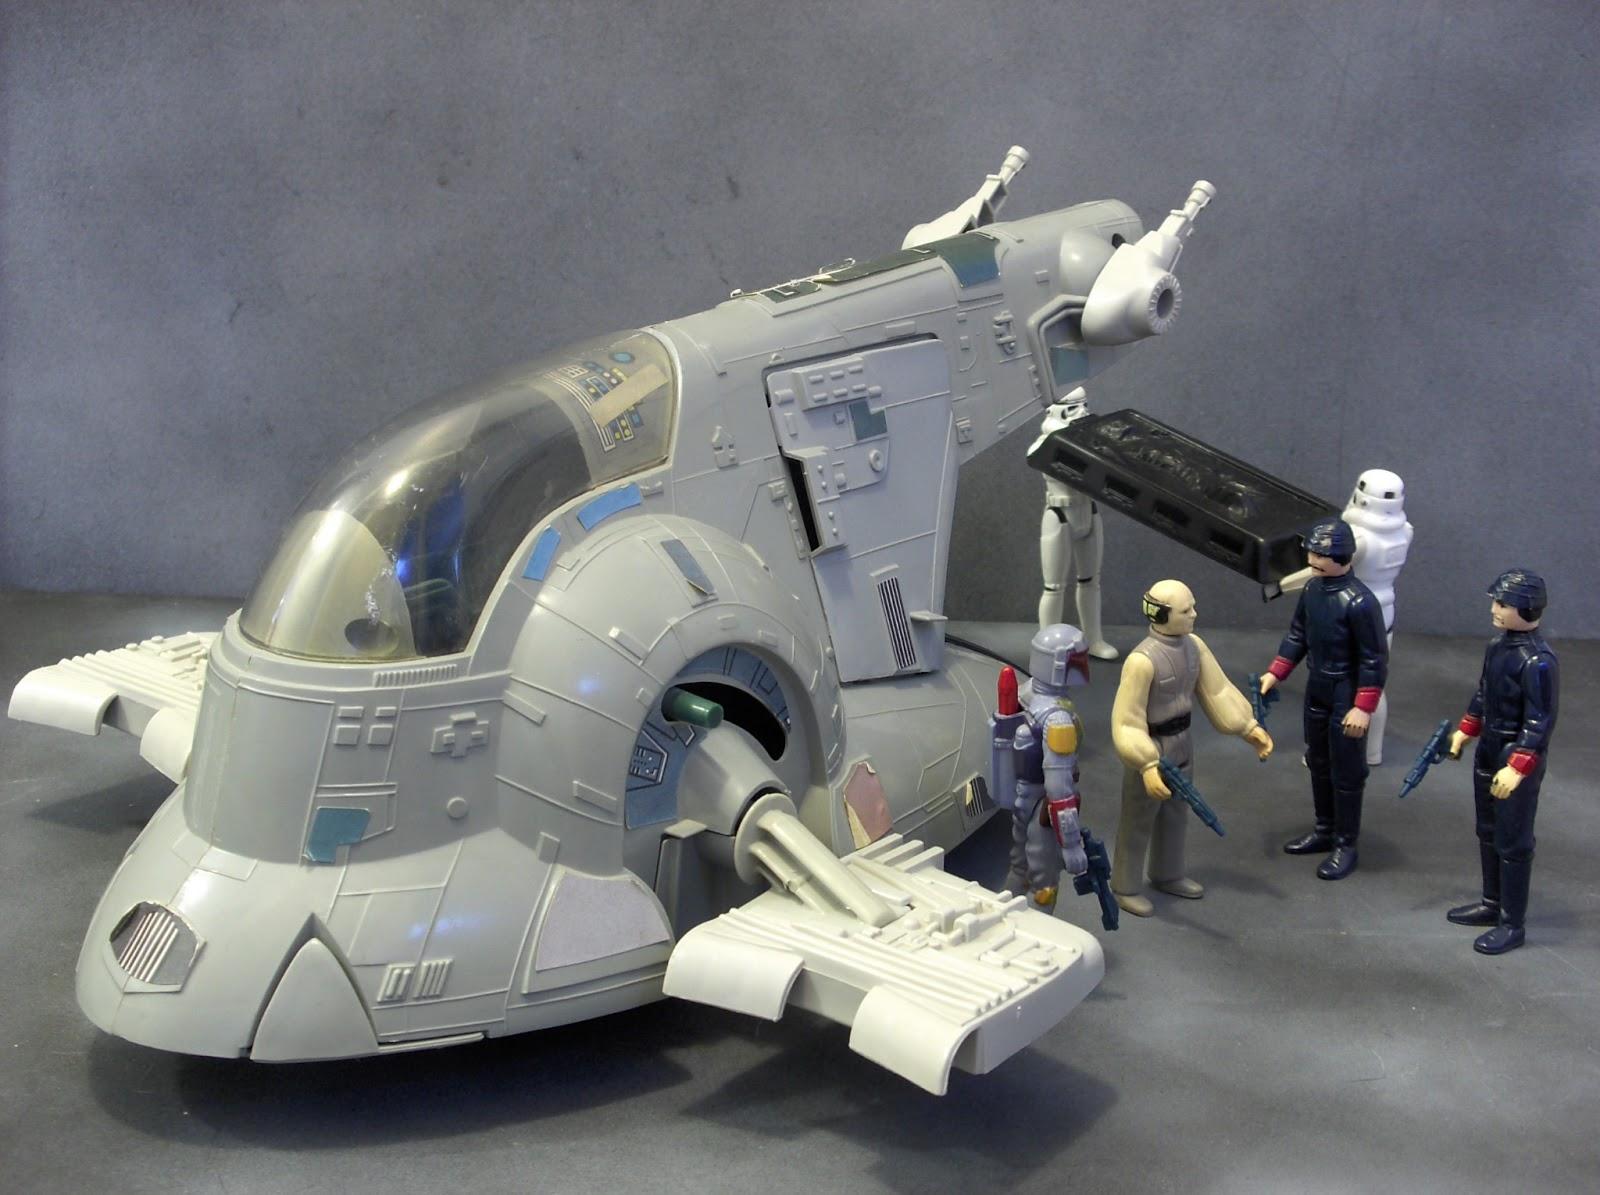 Star Wars Toy Ships : Vintage kenner star wars toys slave i boba fett s spaceship